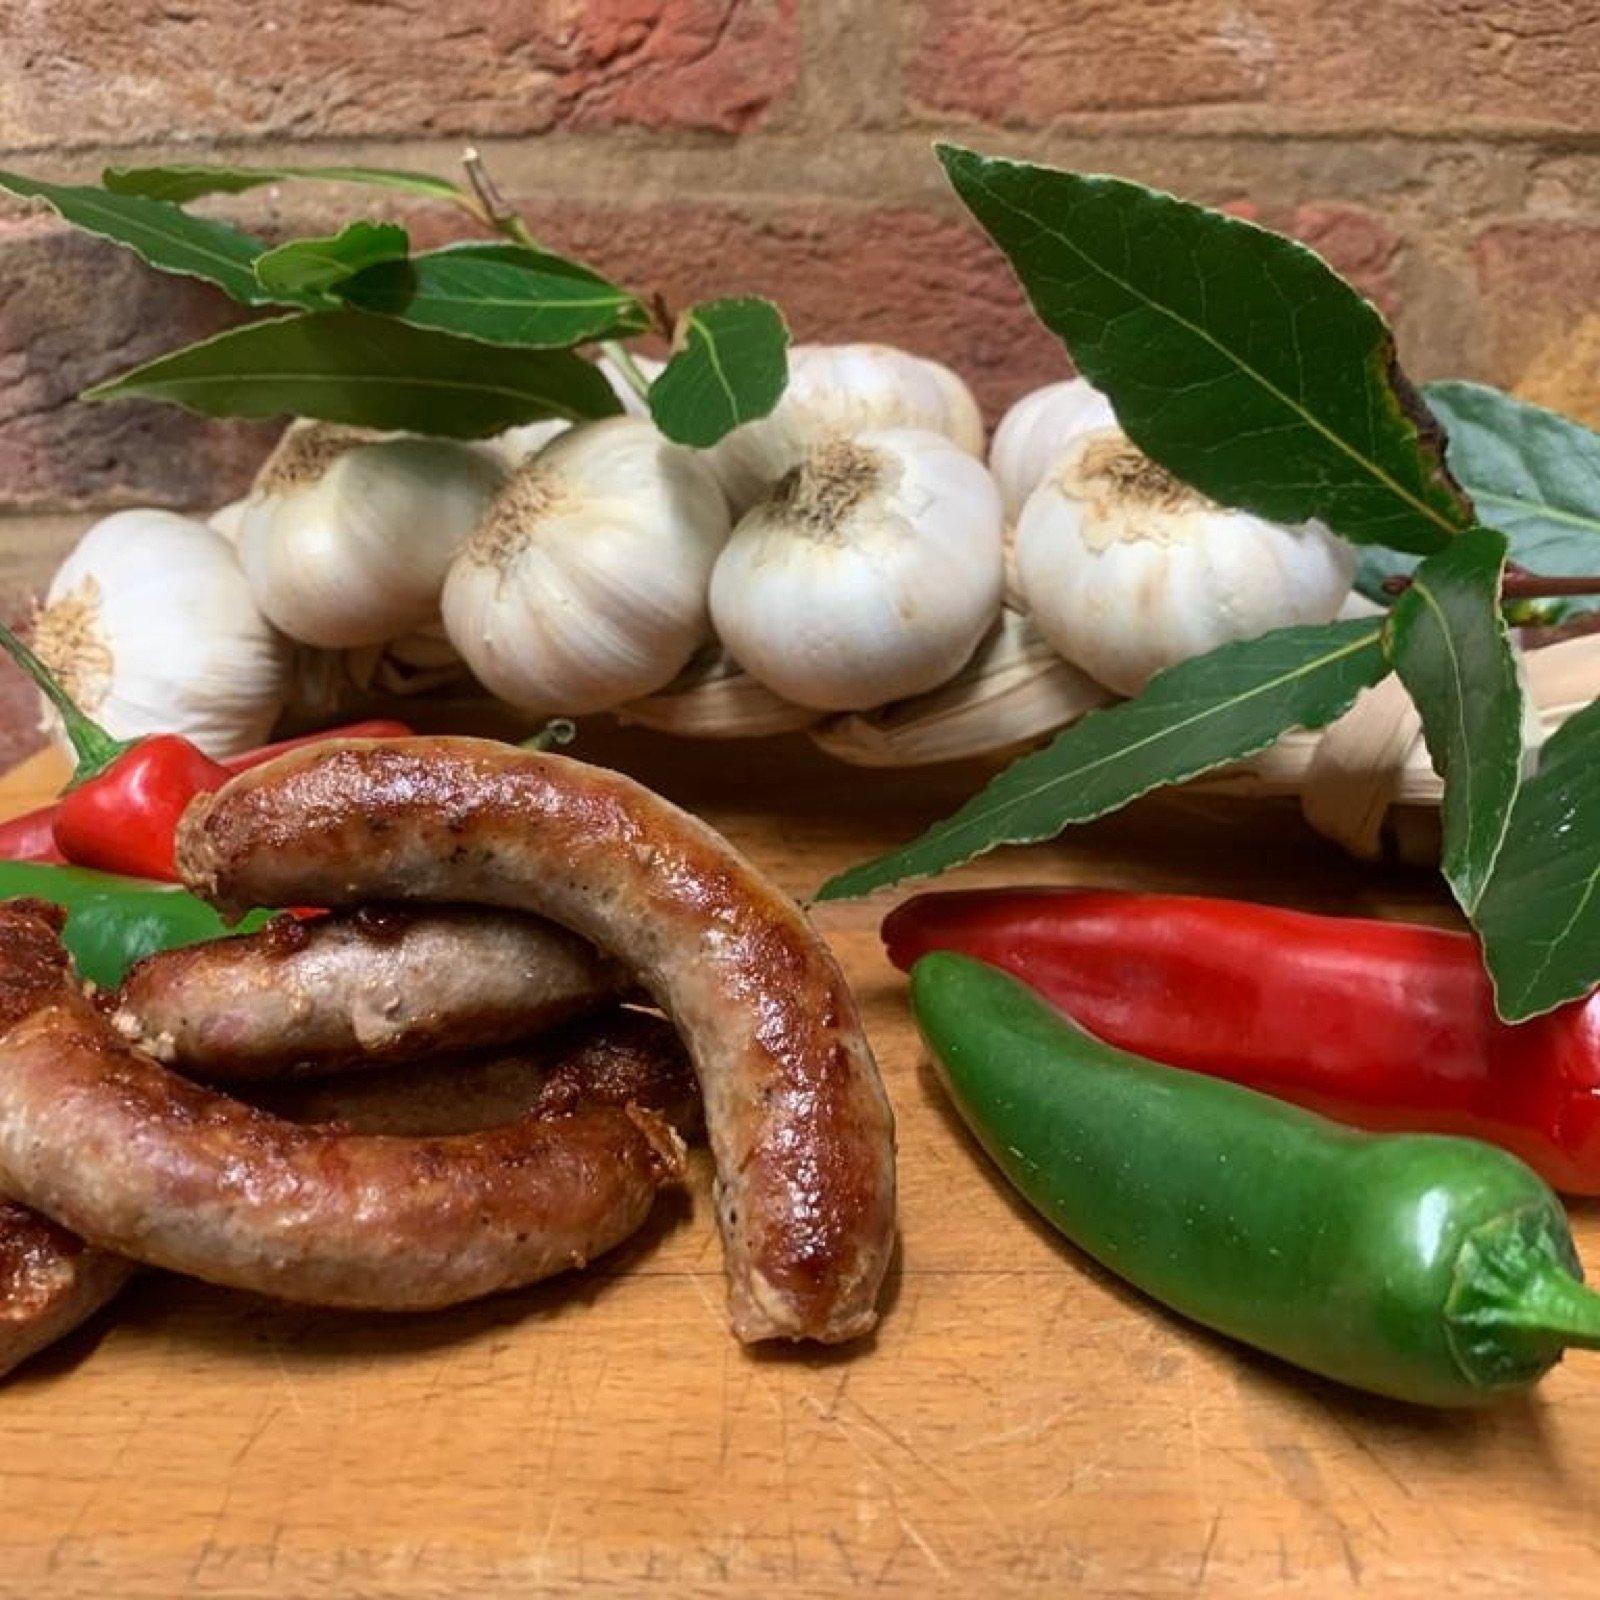 chilli-garlic-sausage